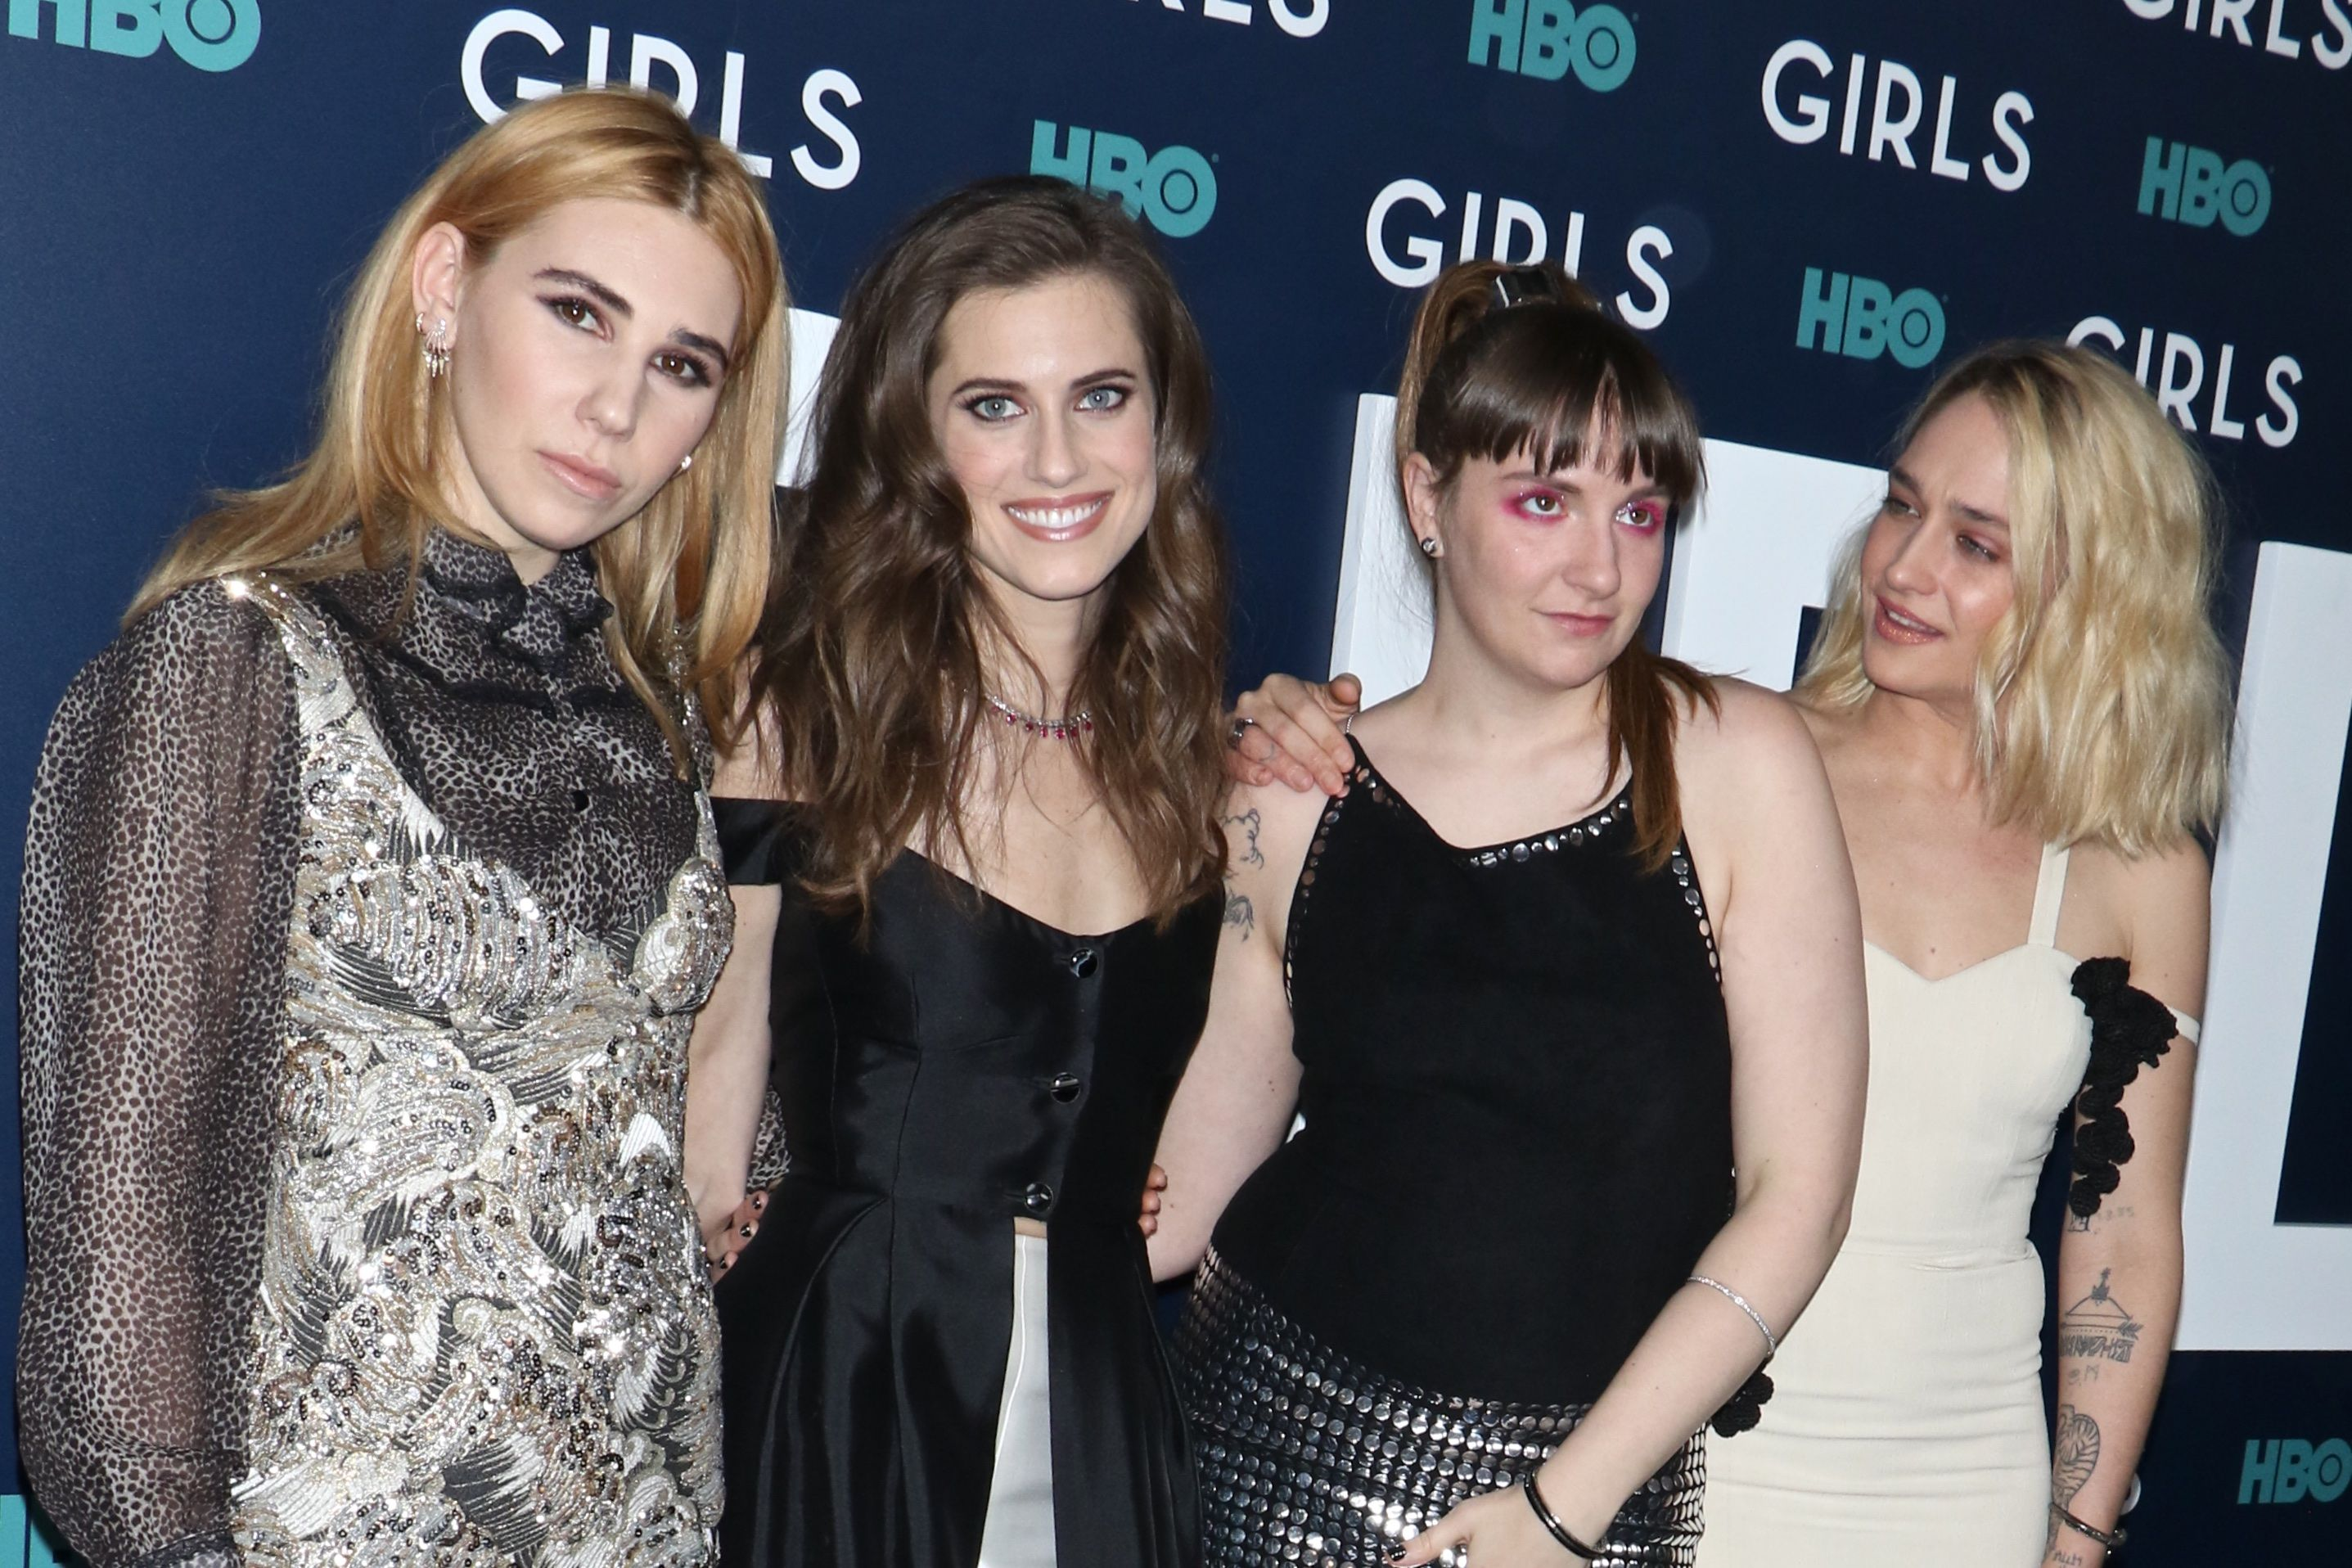 'Girls' TV series season finale premiere, New York, USA - 02 Feb 2017